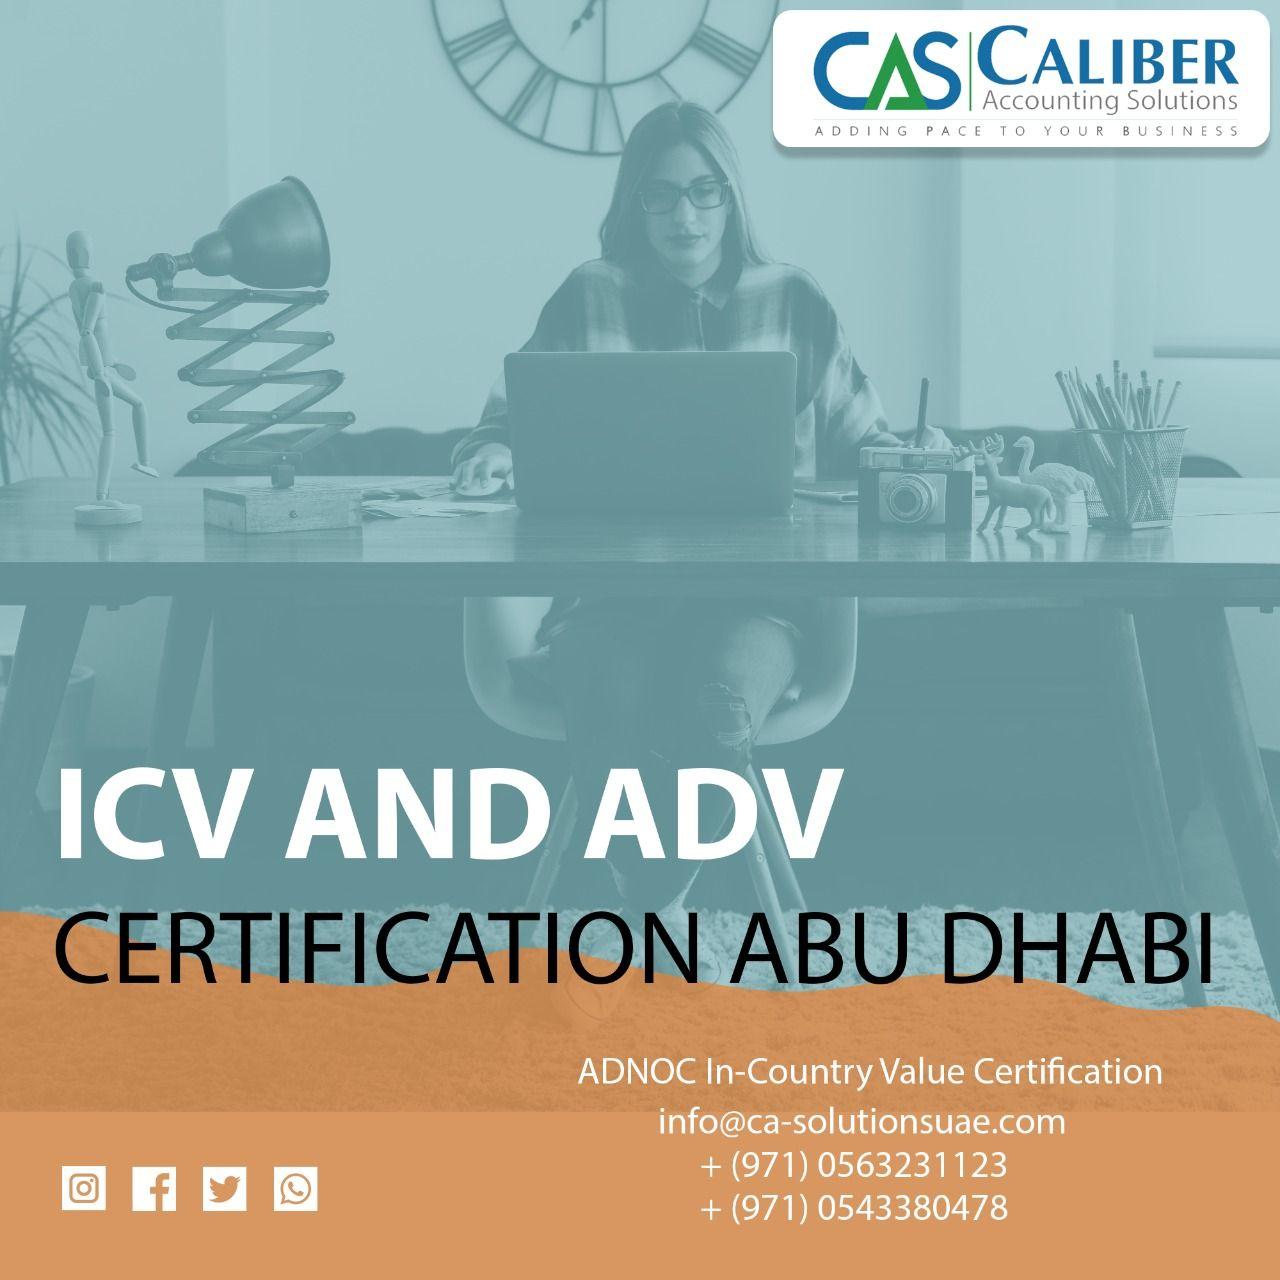 ADNOC ICV Certification Company in Abu Dhabi UAE in 2020